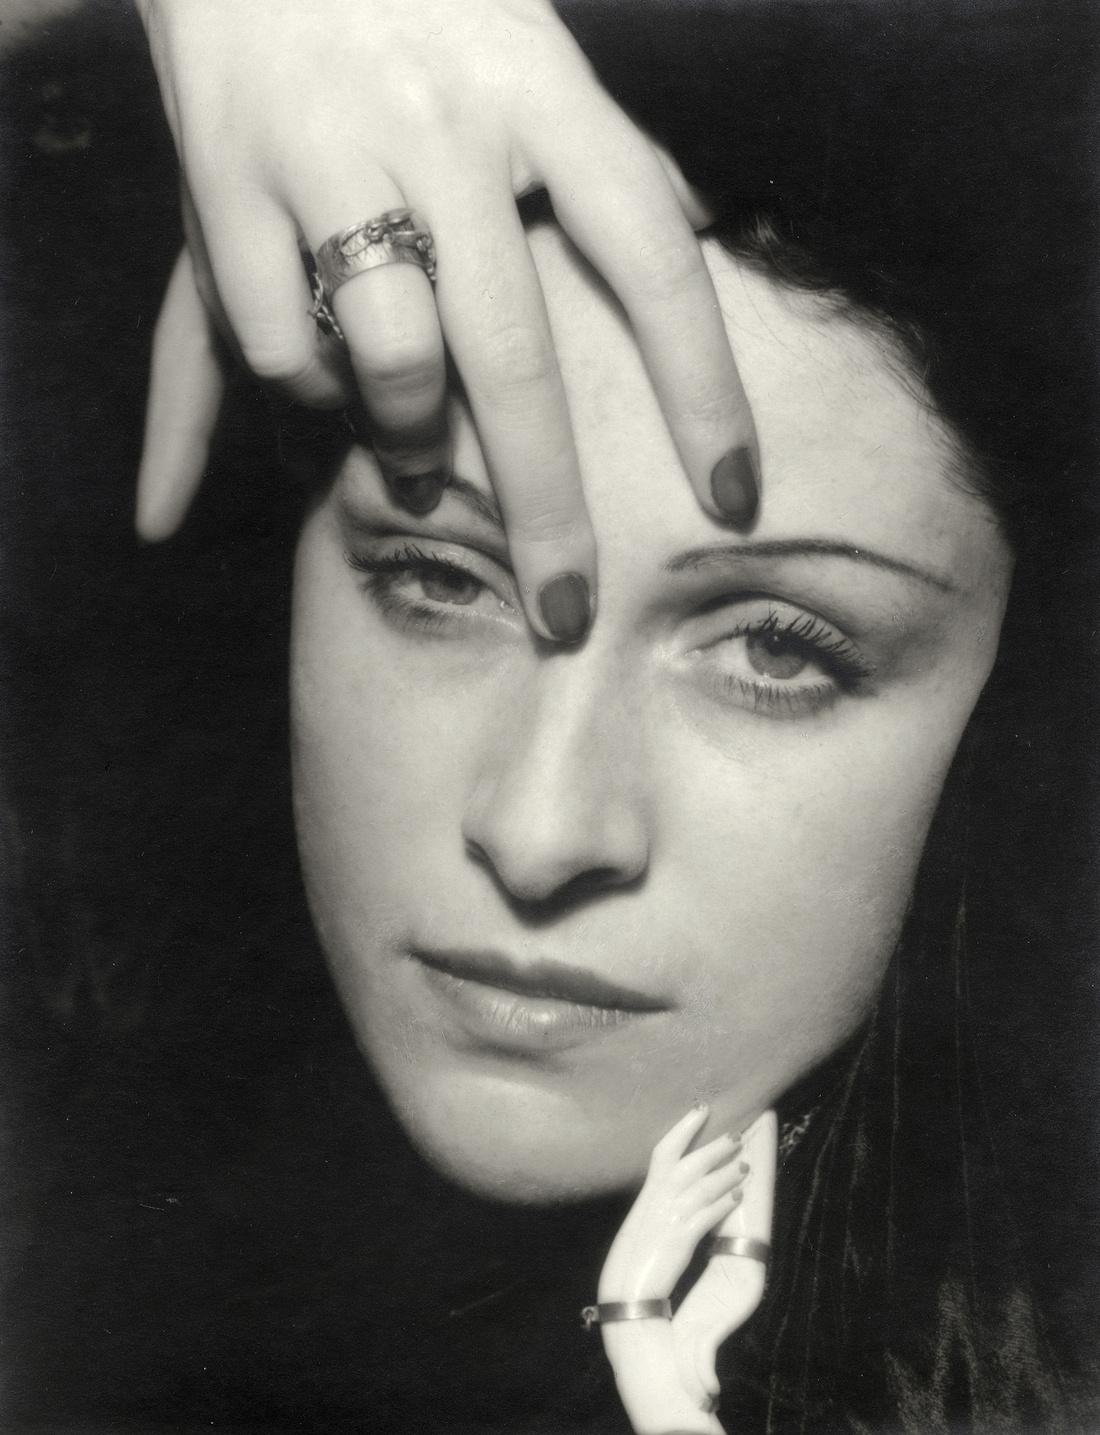 Man Ray, Portrait of Dora Maar, 1936. Image via The Red List.